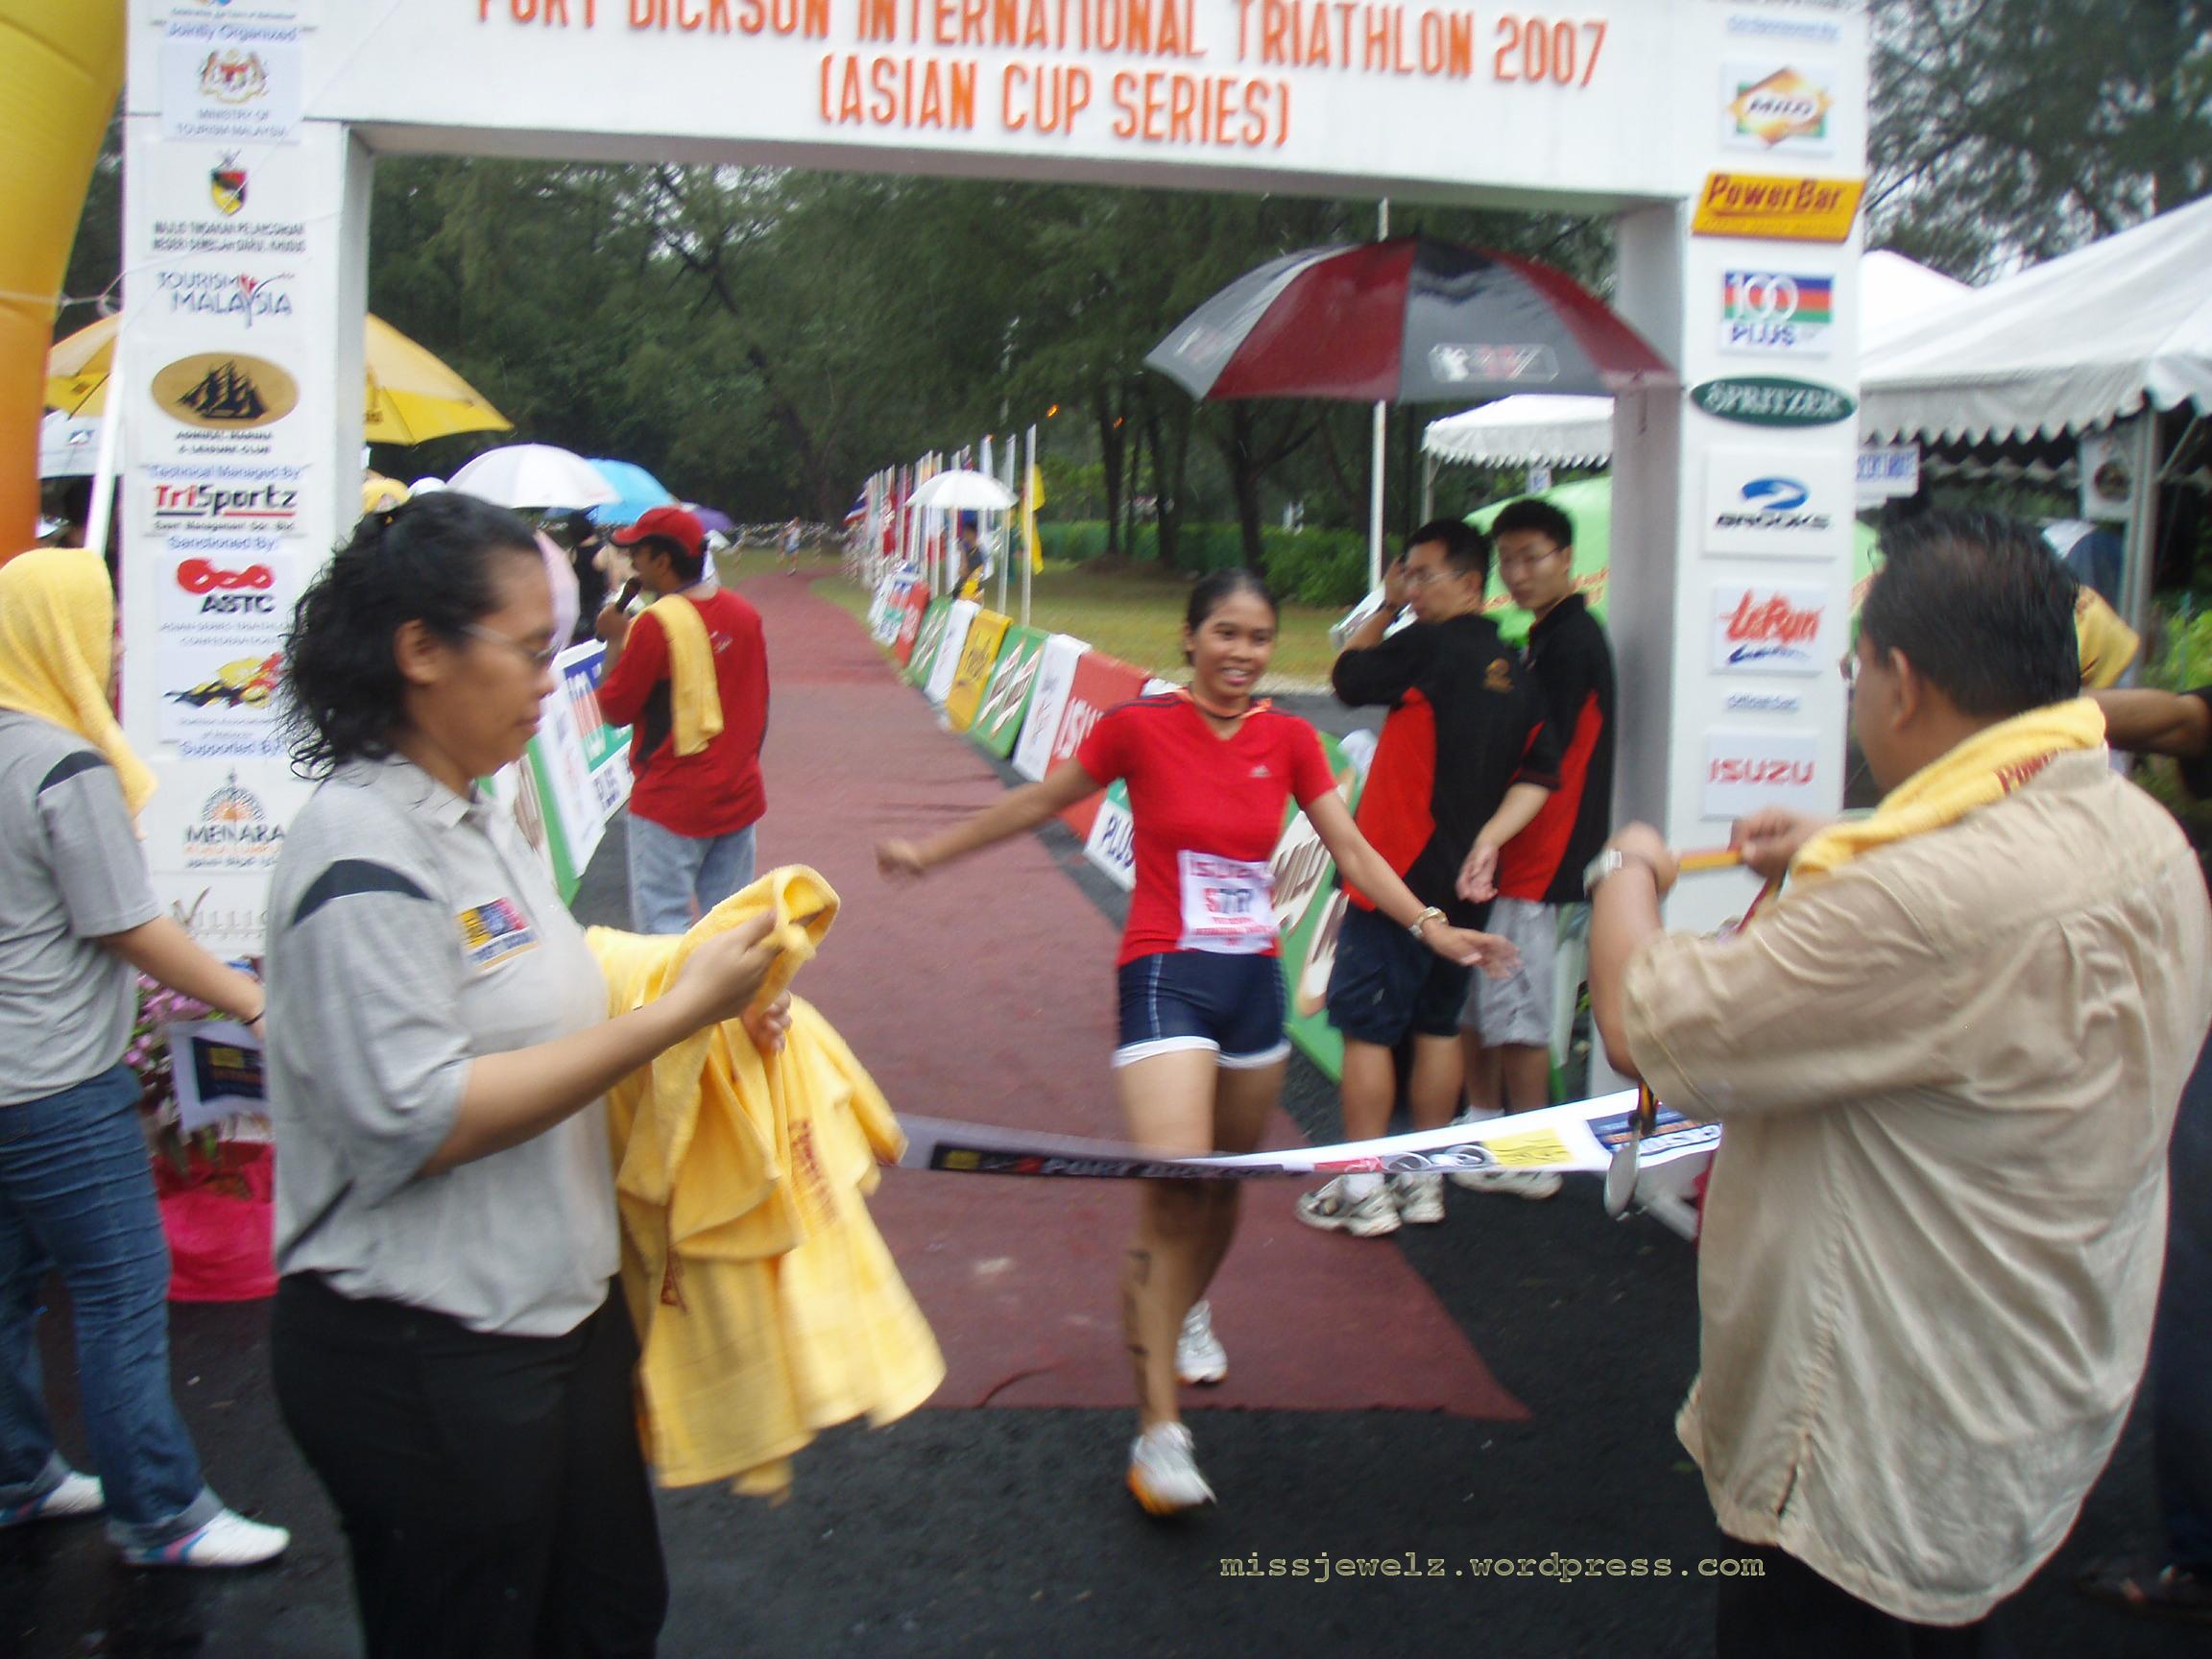 Second sprint tri finish !1:12